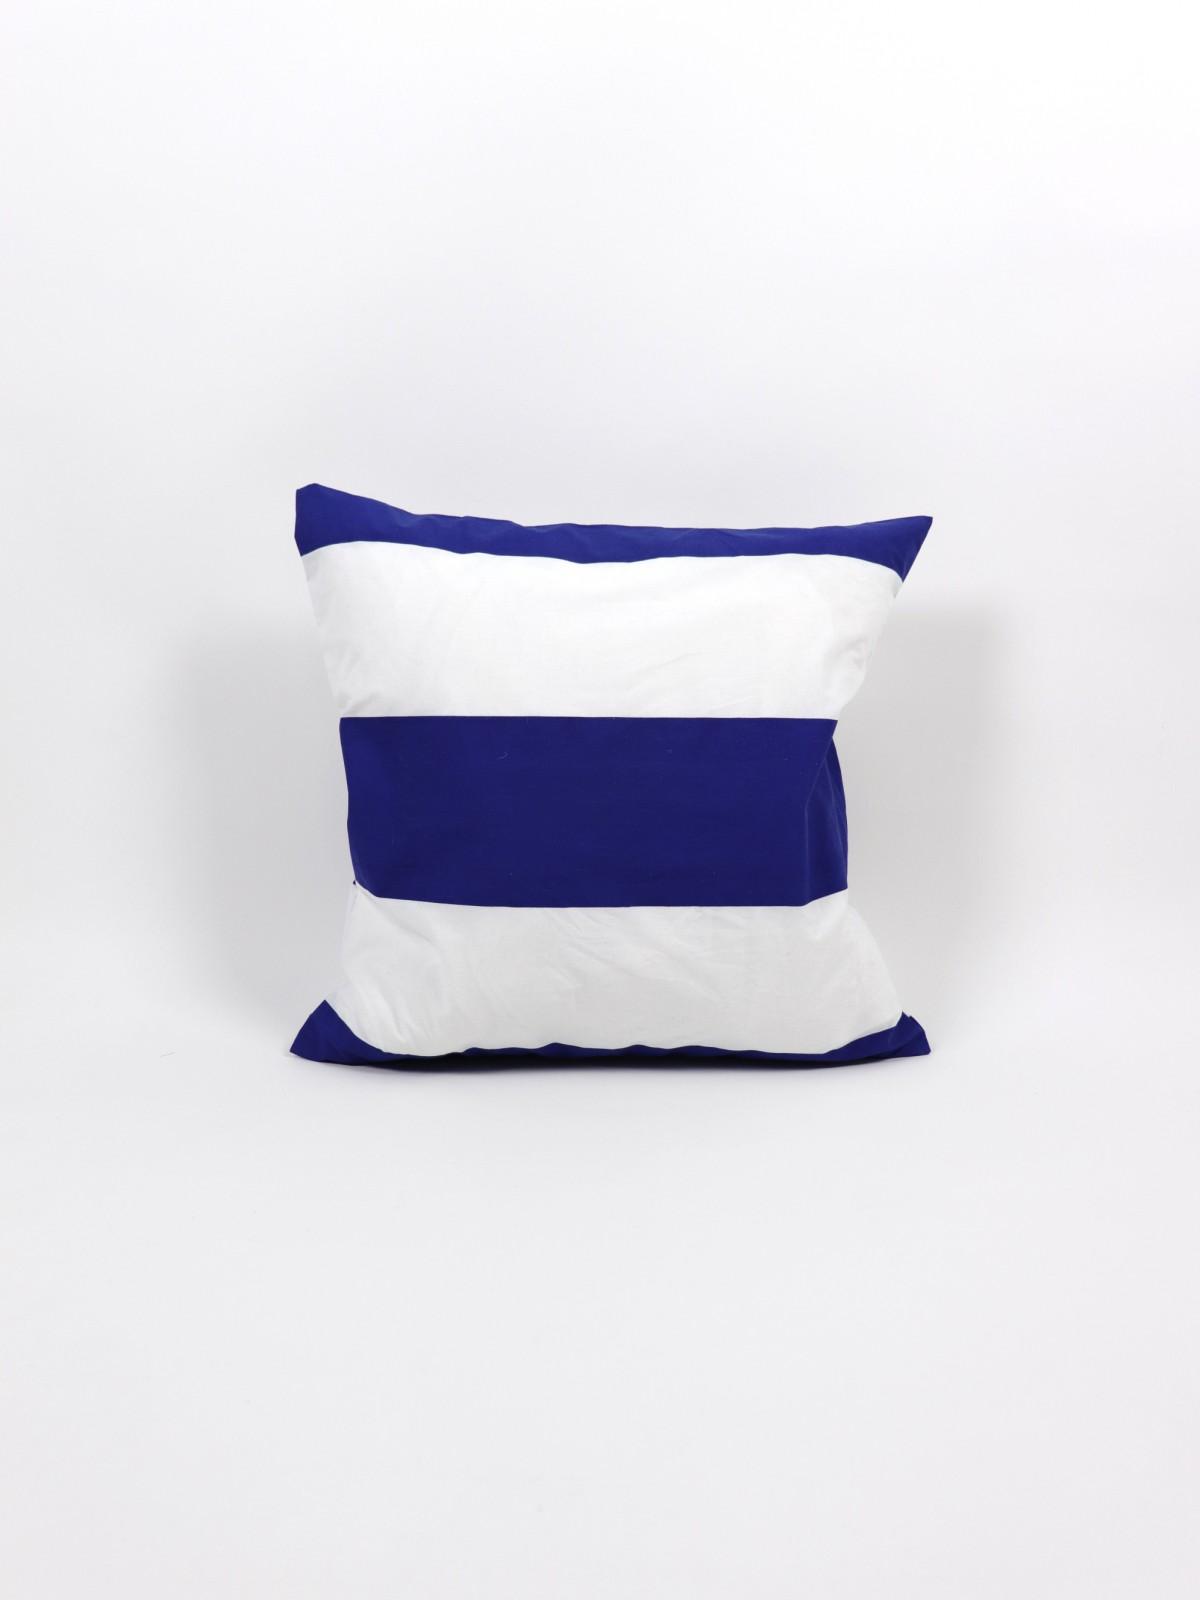 Ralph lauren, Deadstock cotton,USA,Brown.remake, cushion